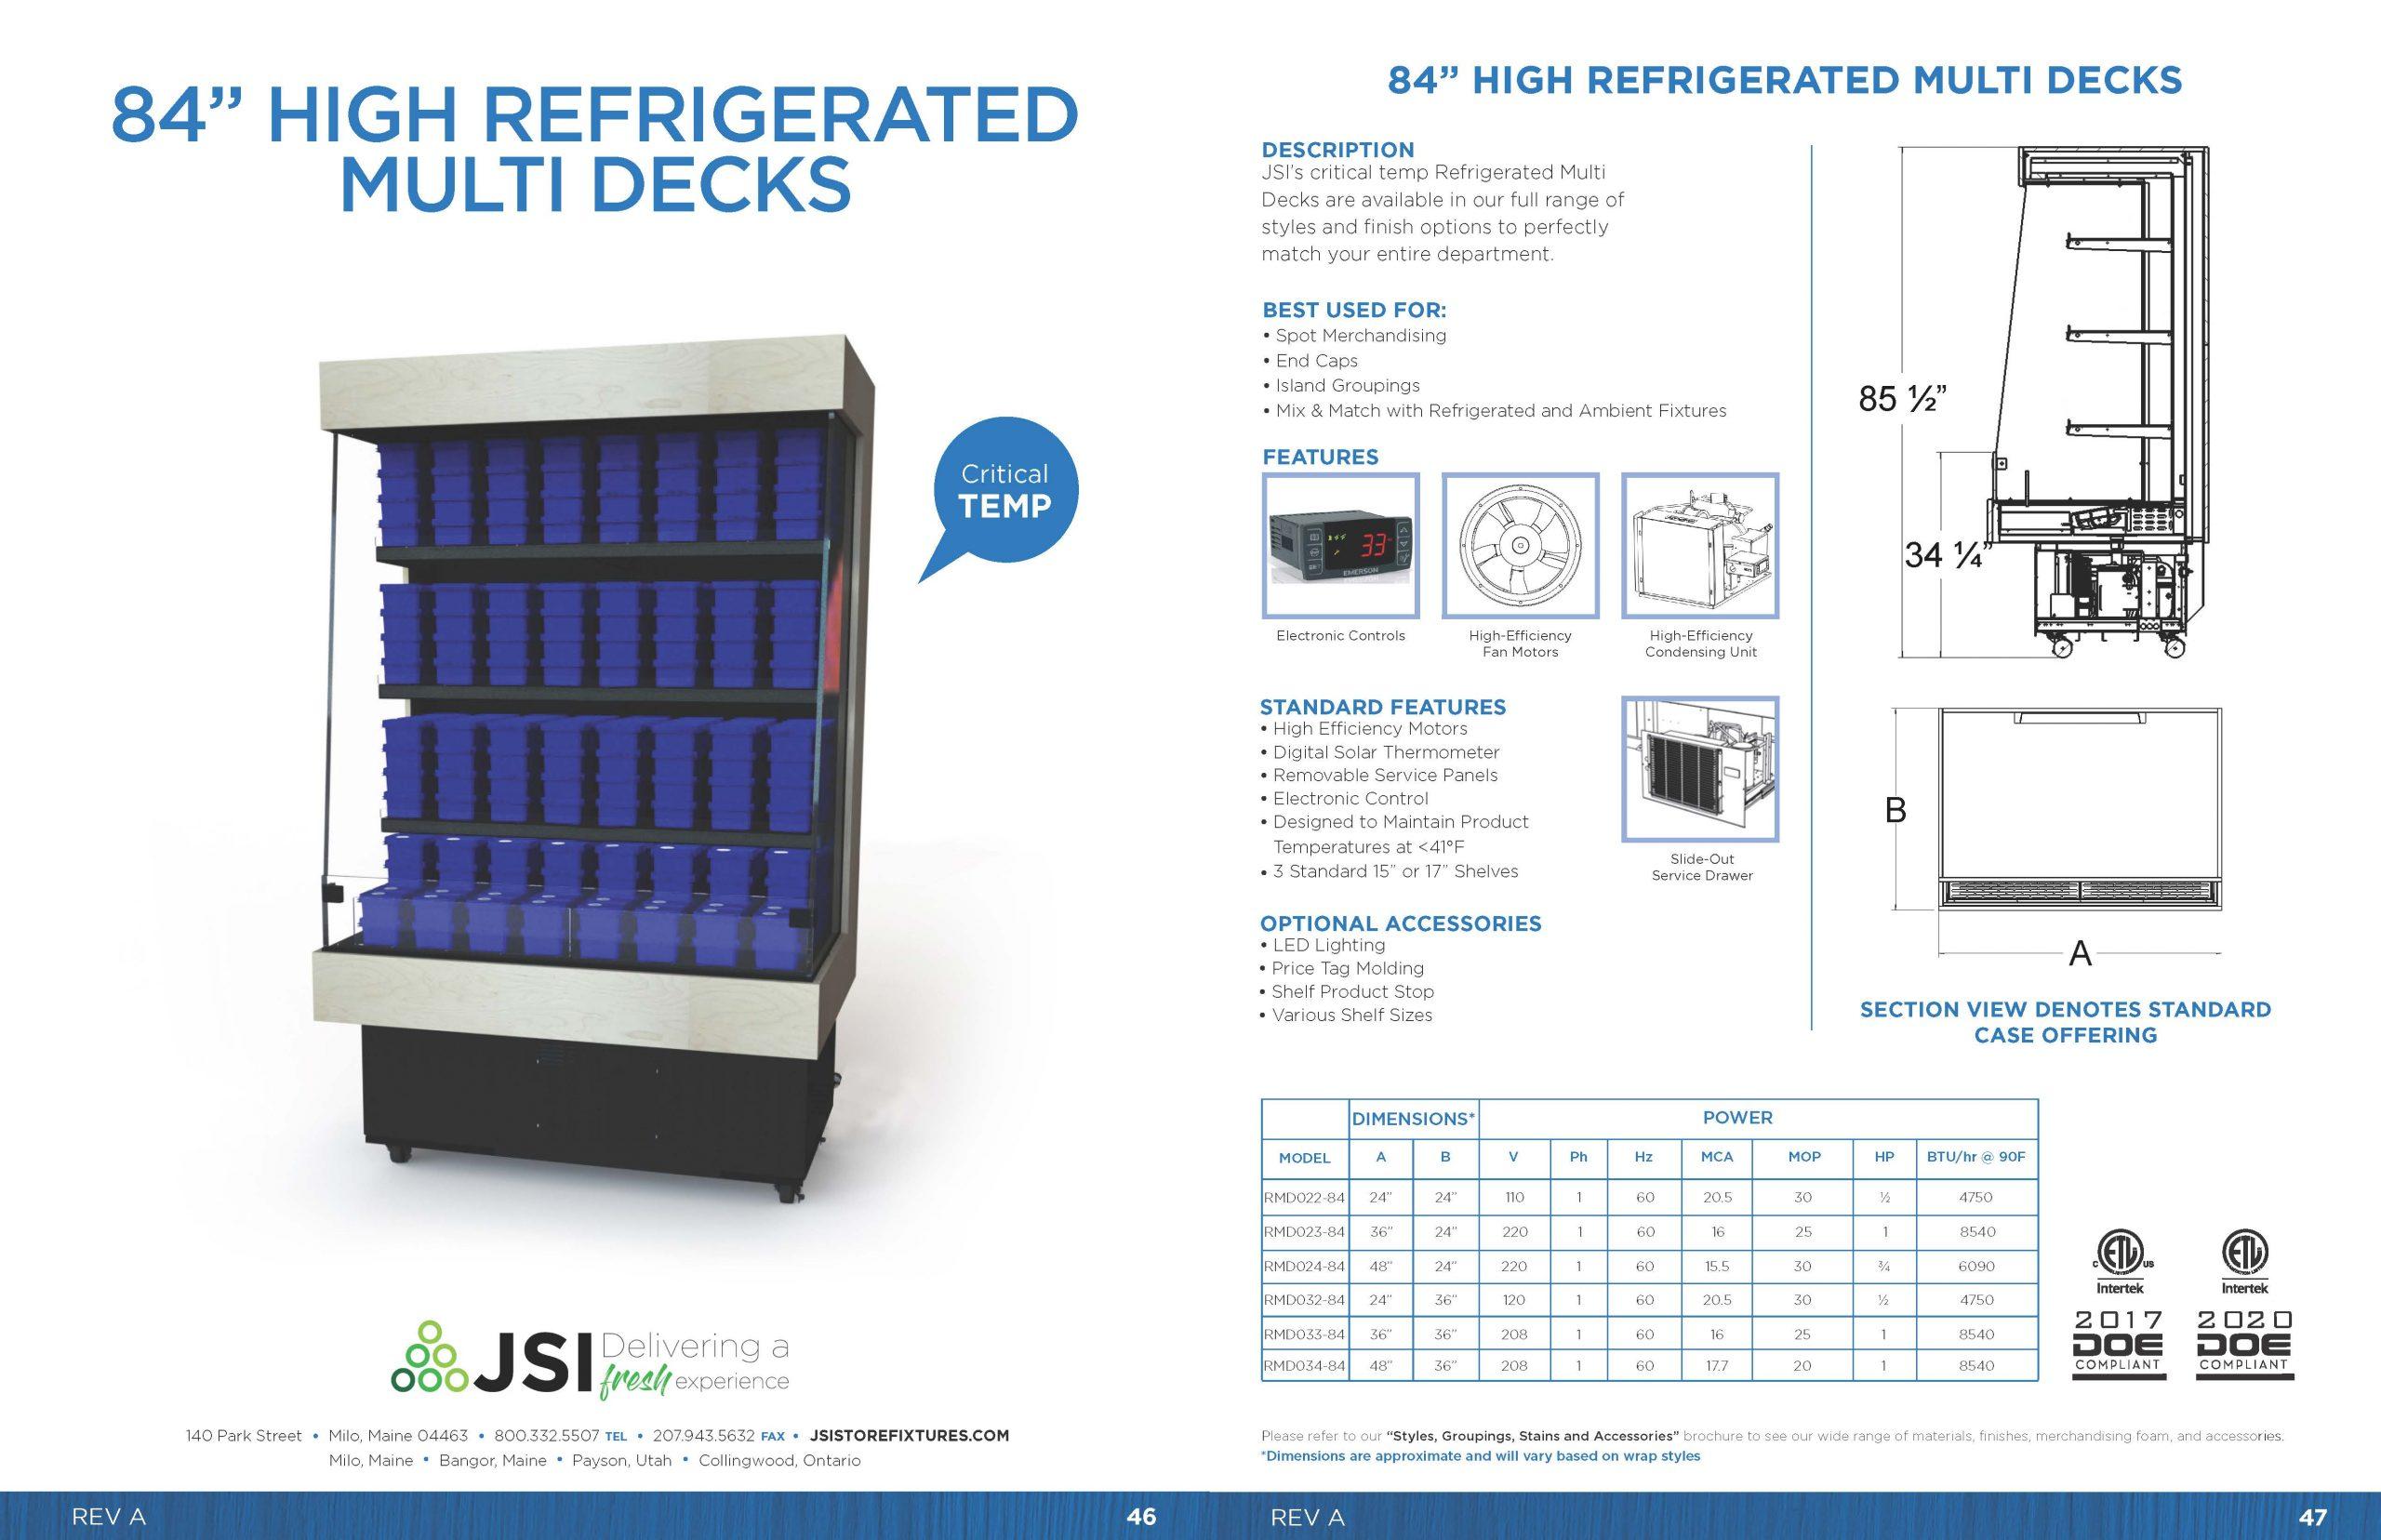 84in High Refrigerated Multi Decks